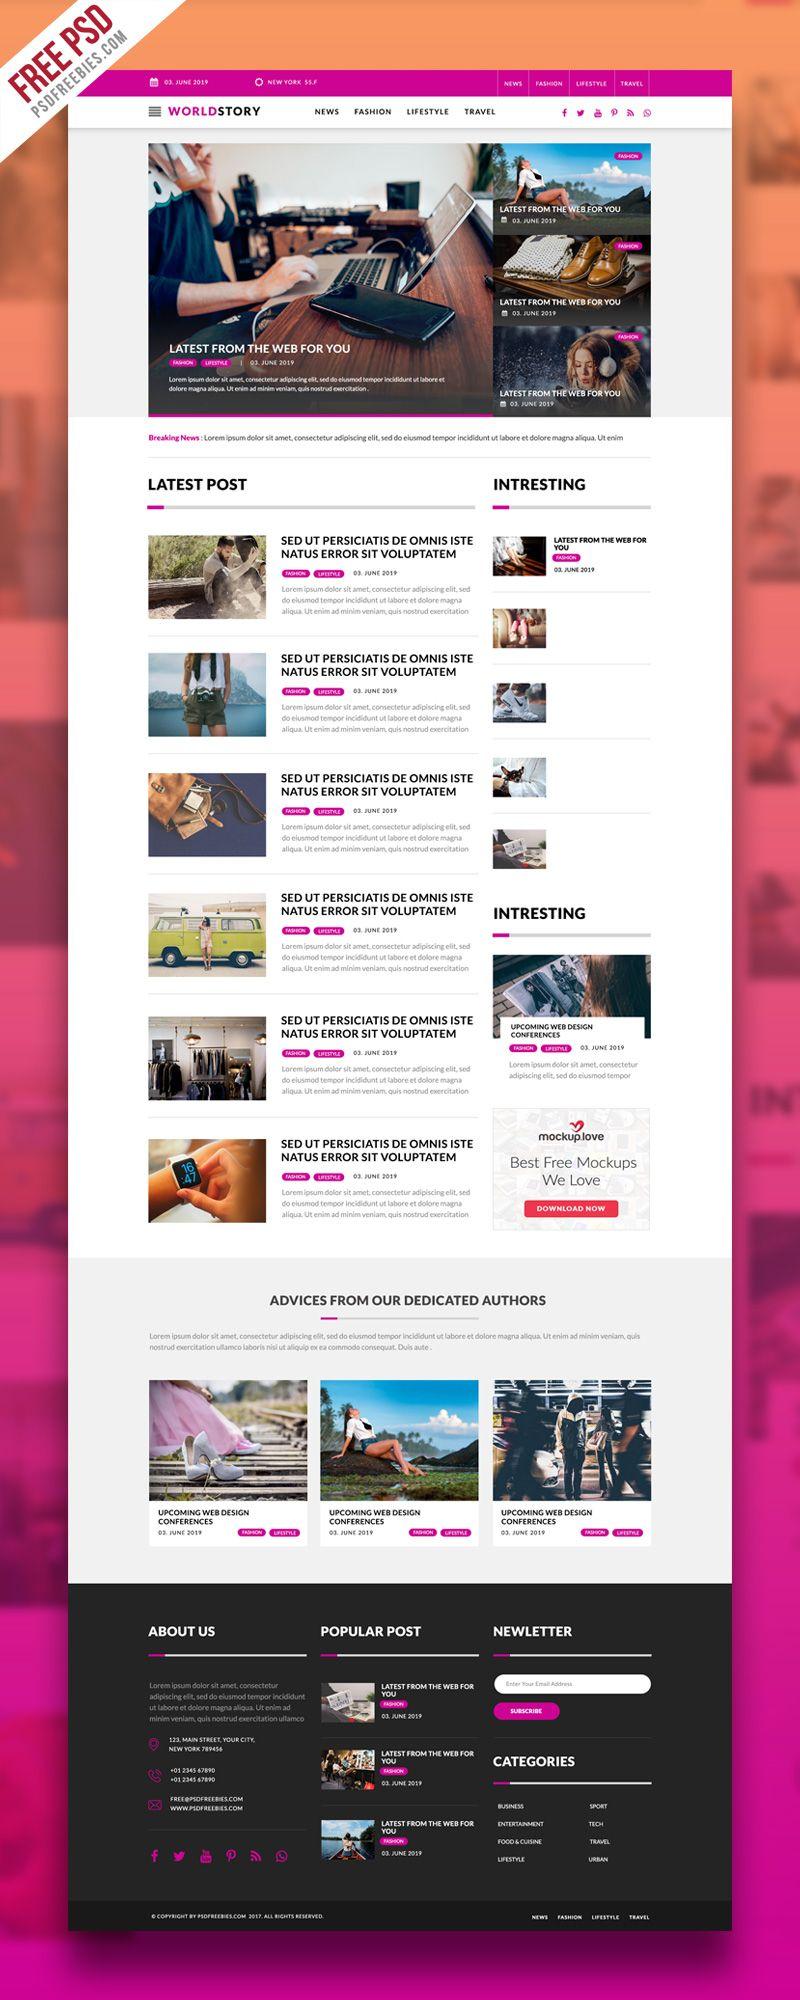 Multipurpose Magazine Blog Web Template Free Psd Psdfreebies Com Free Web Template Web Template Free Psd